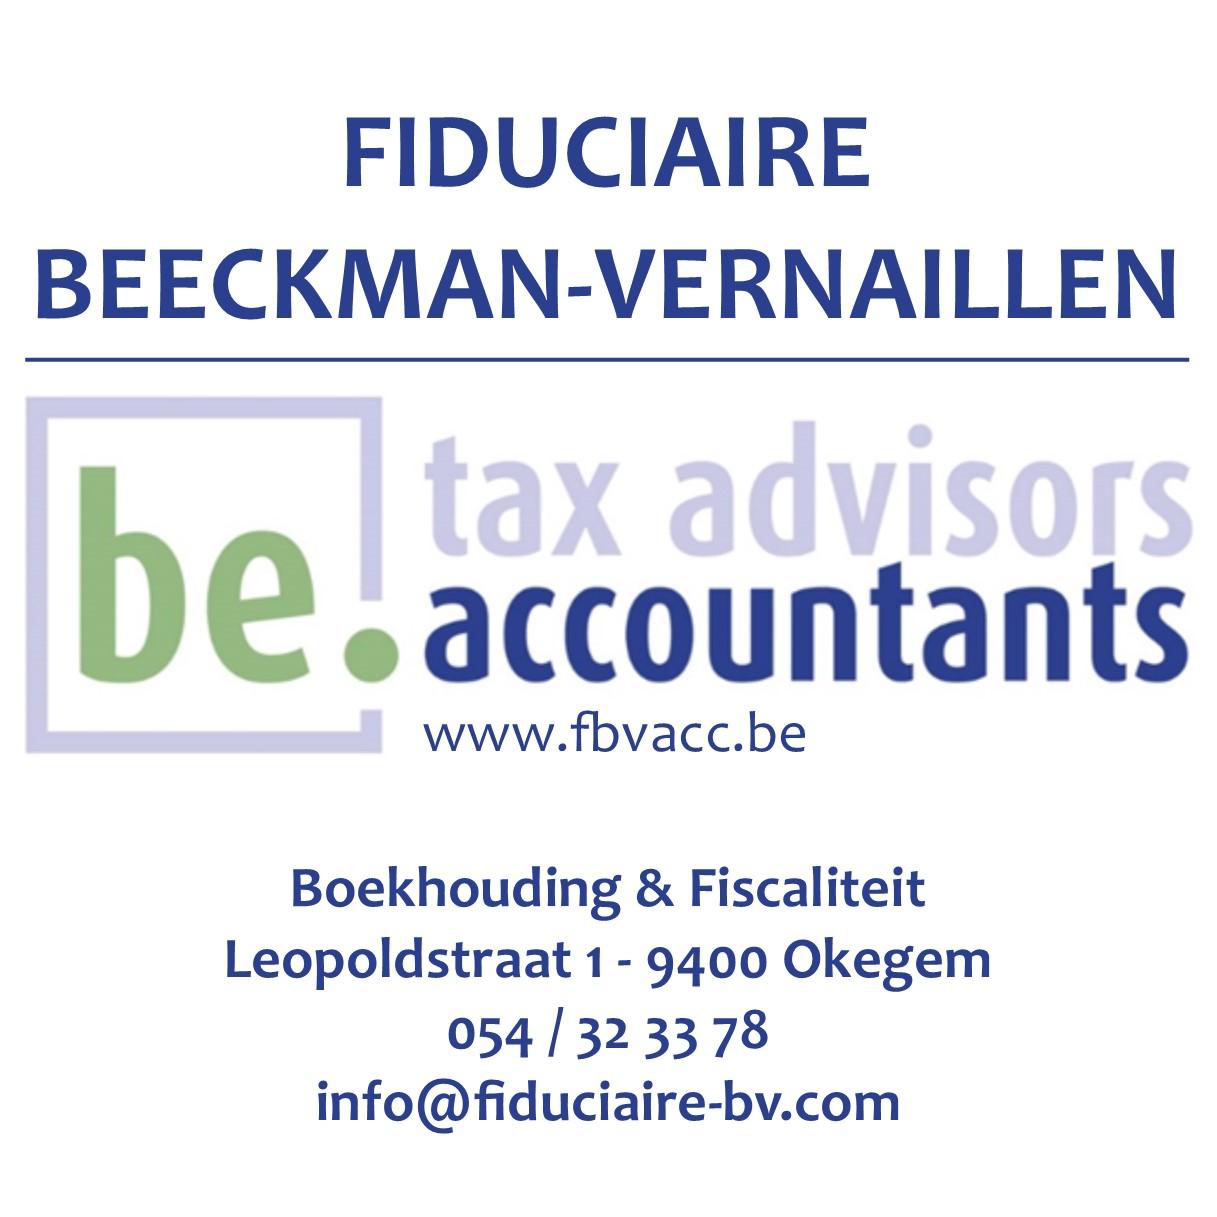 beeckman